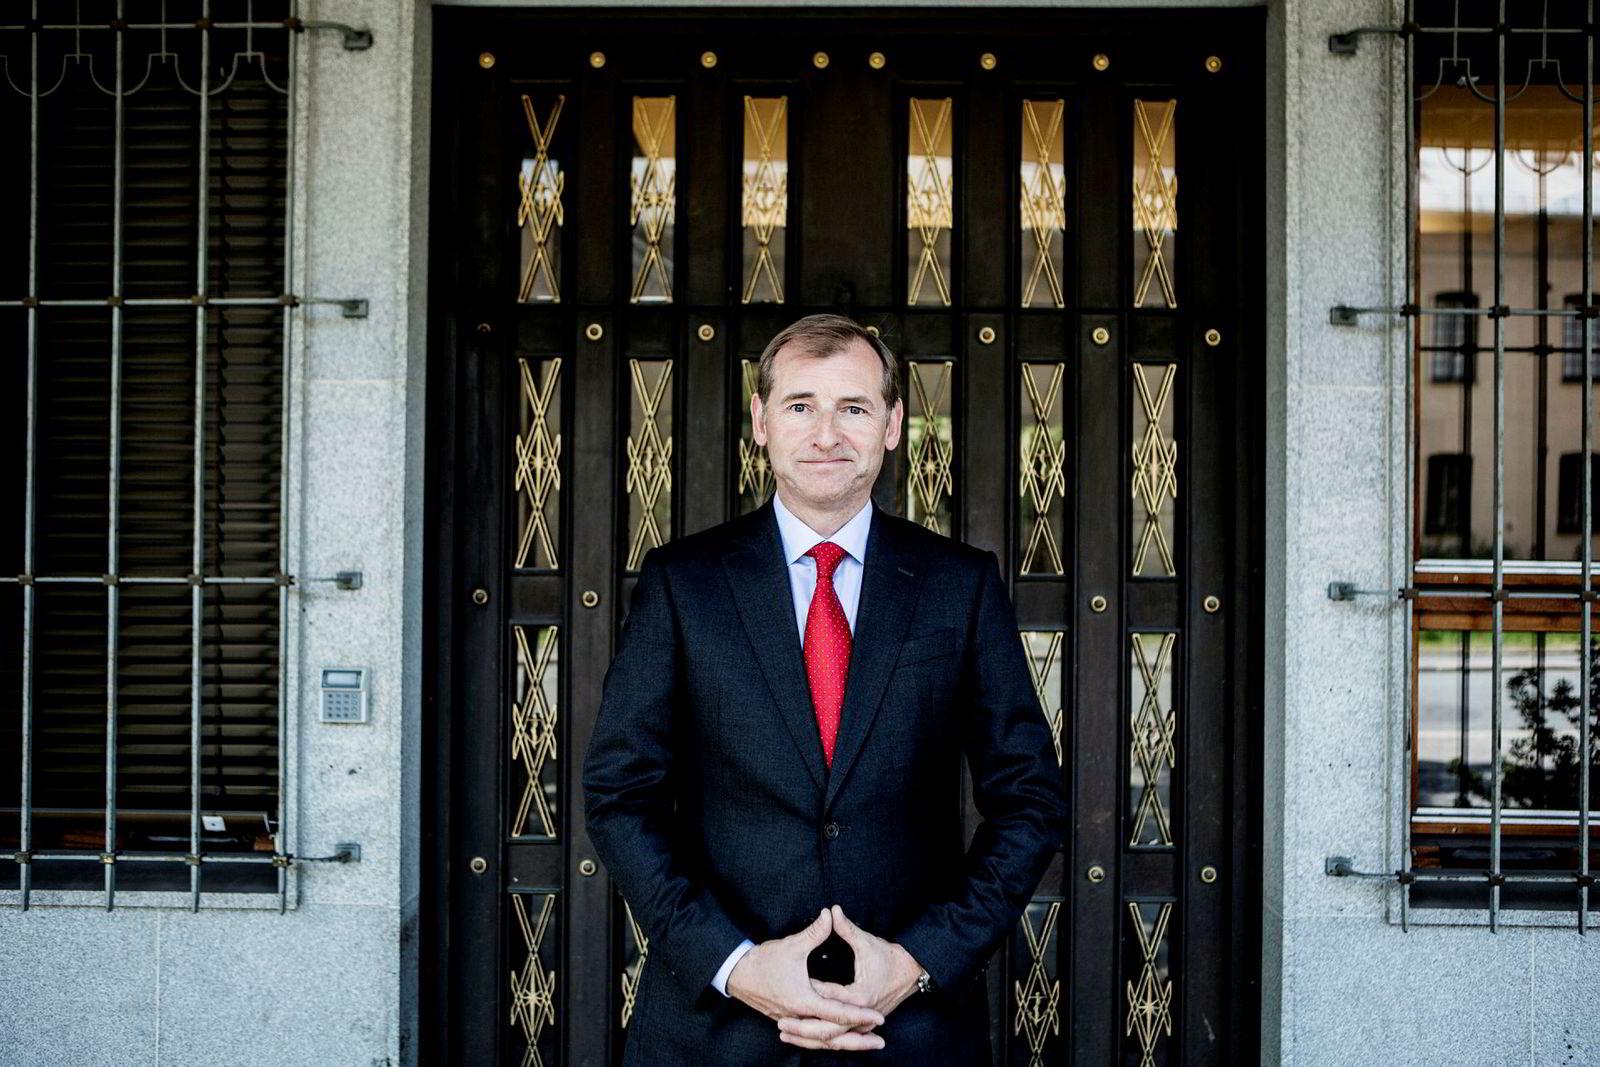 Administrerende direktør Carl O. Geving i Norges Eiendomsmeglerforbund